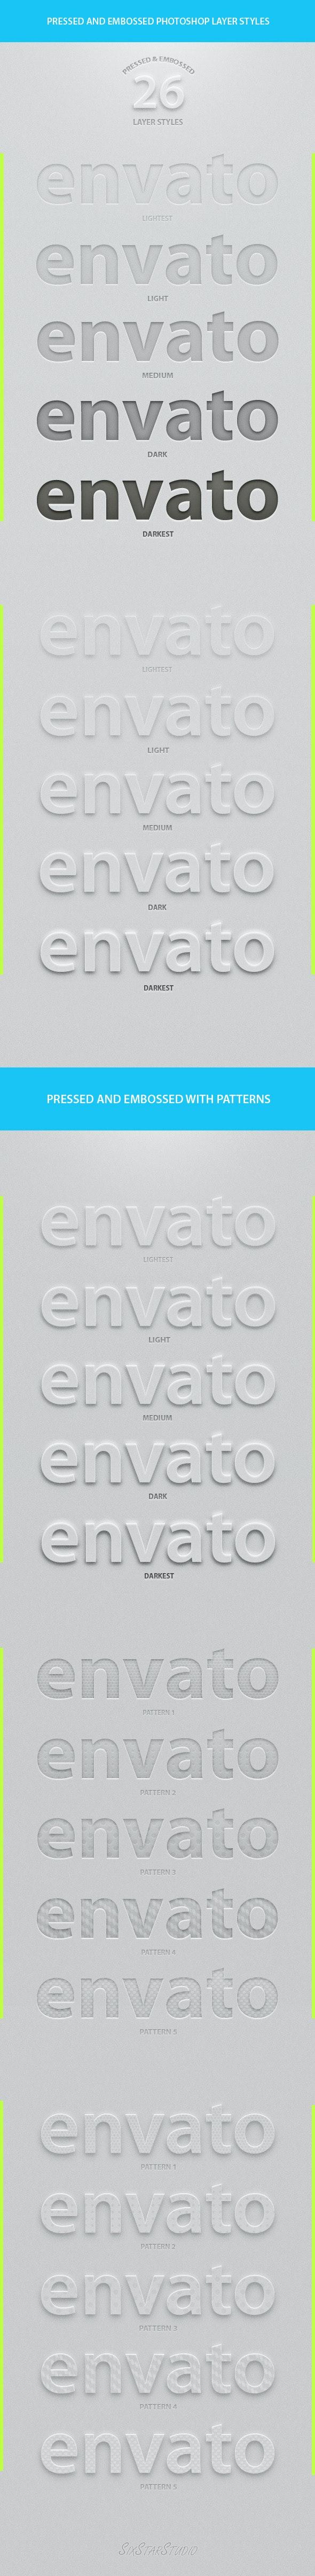 26 Pressed & Embossed Styles - Styles Photoshop